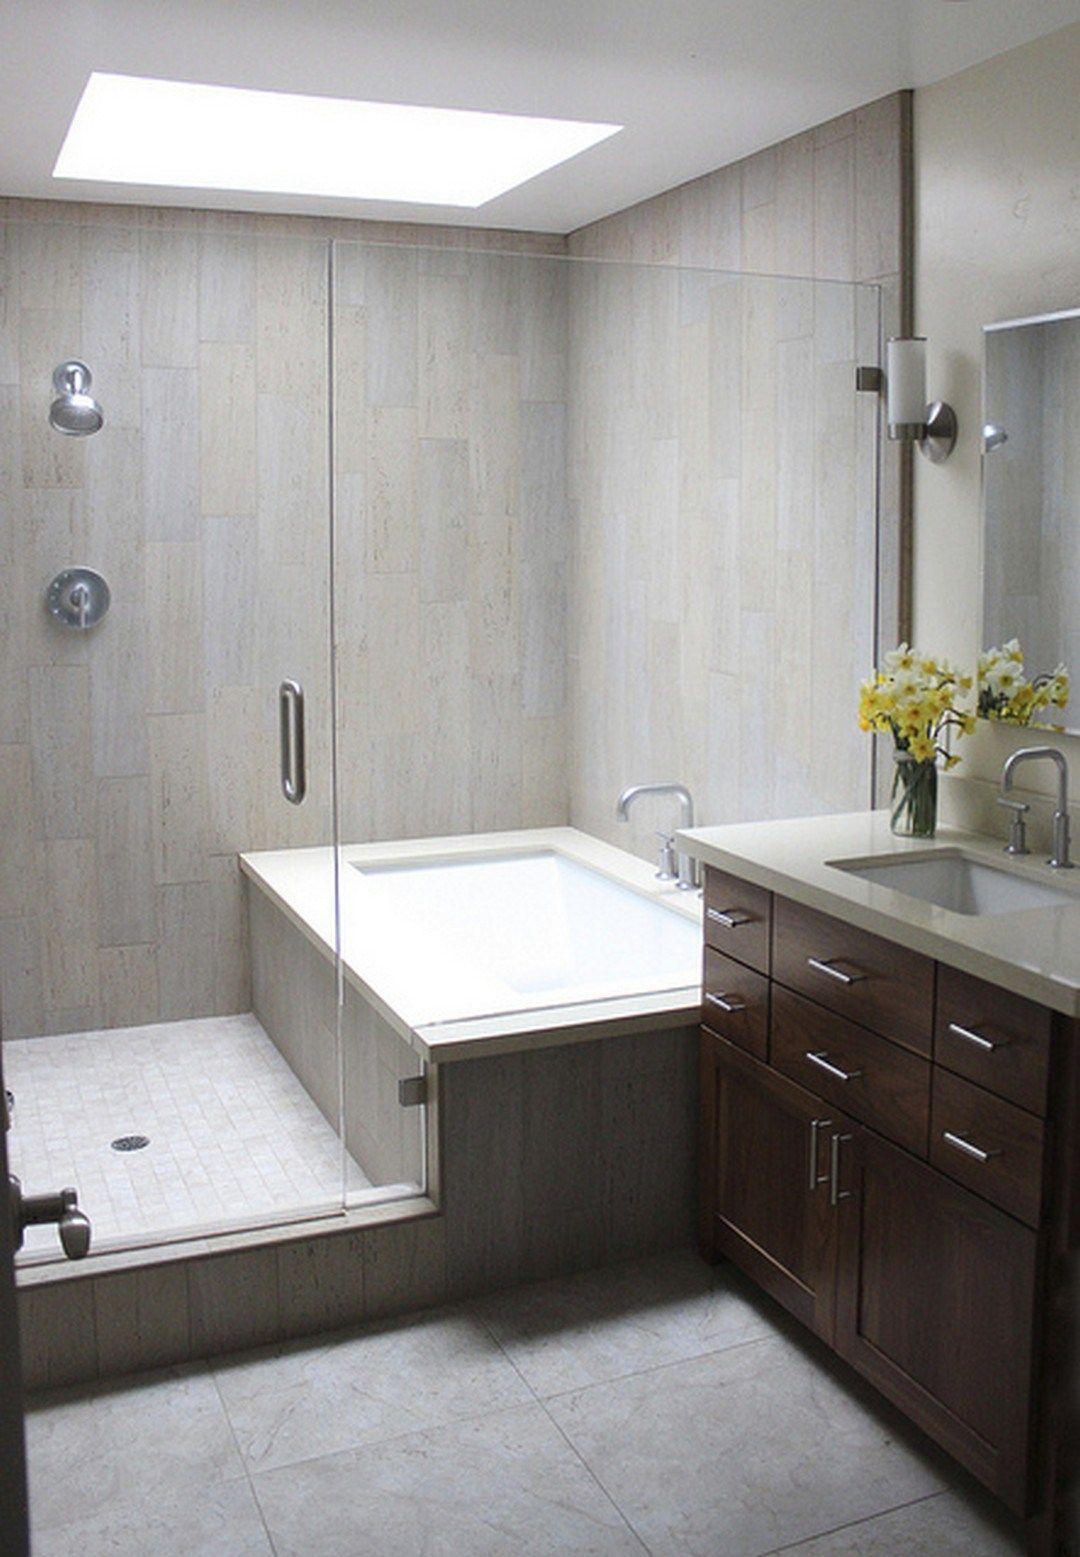 99 Small Master Bathroom Makeover Ideas On A Budget (65) | Home ...